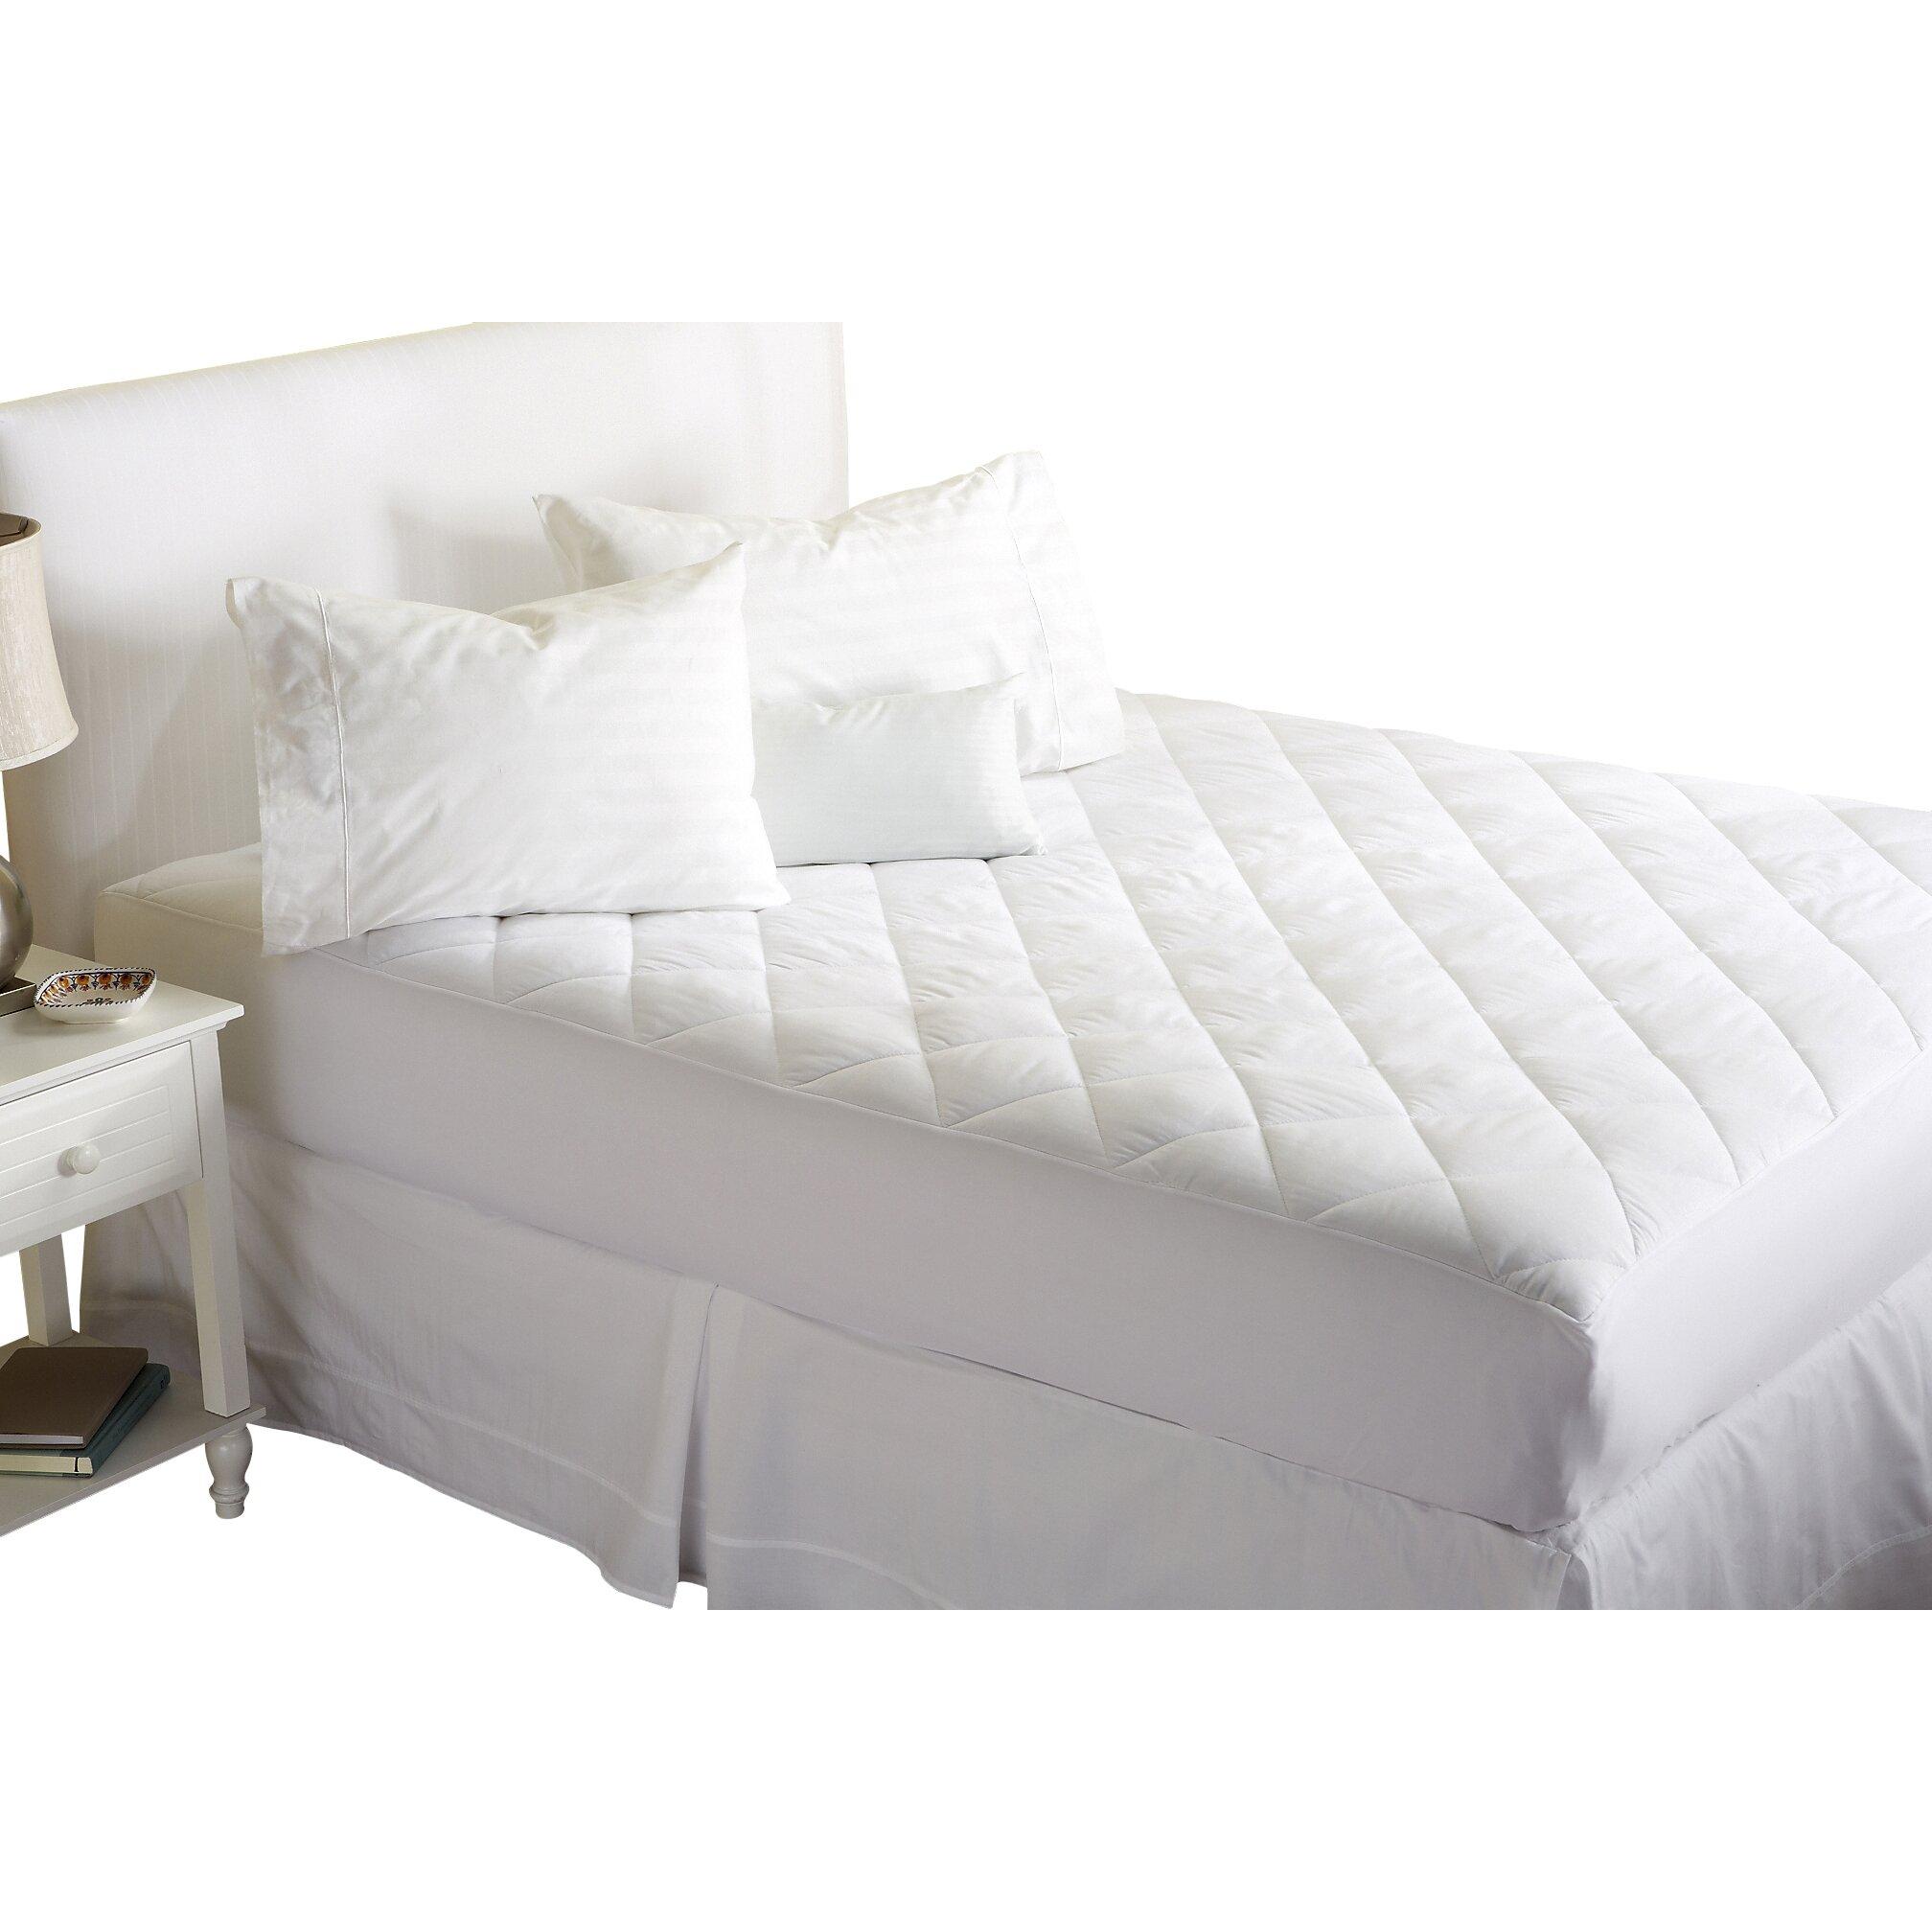 Home fashion design tranquility mattress pad reviews wayfair - Home design mattress pads ...